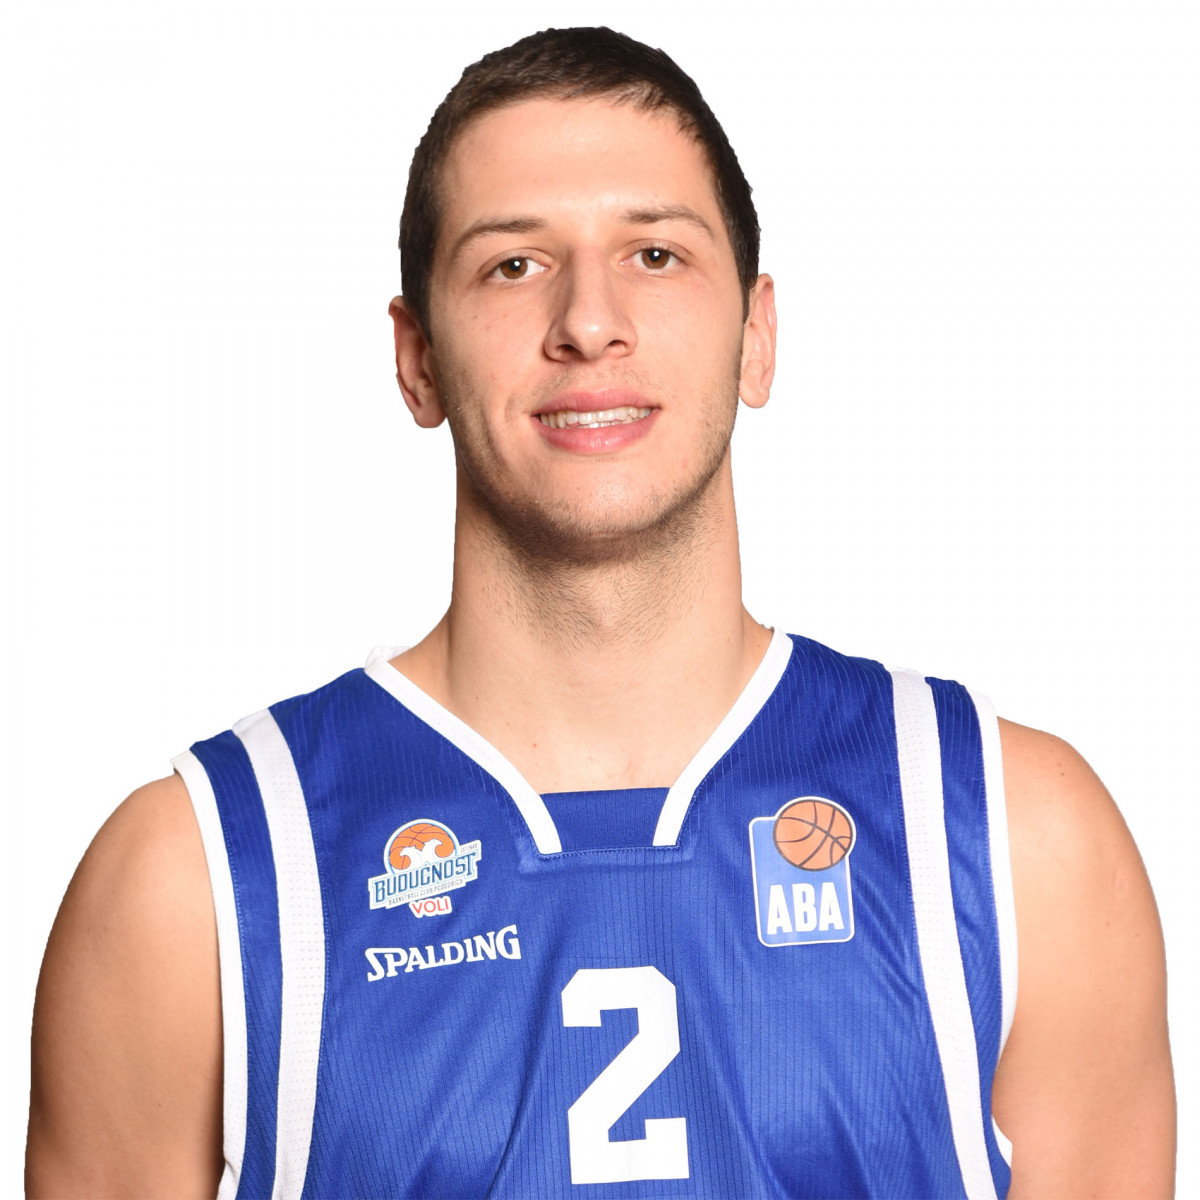 Photo of Nikola Ivanovic, 2018-2019 season